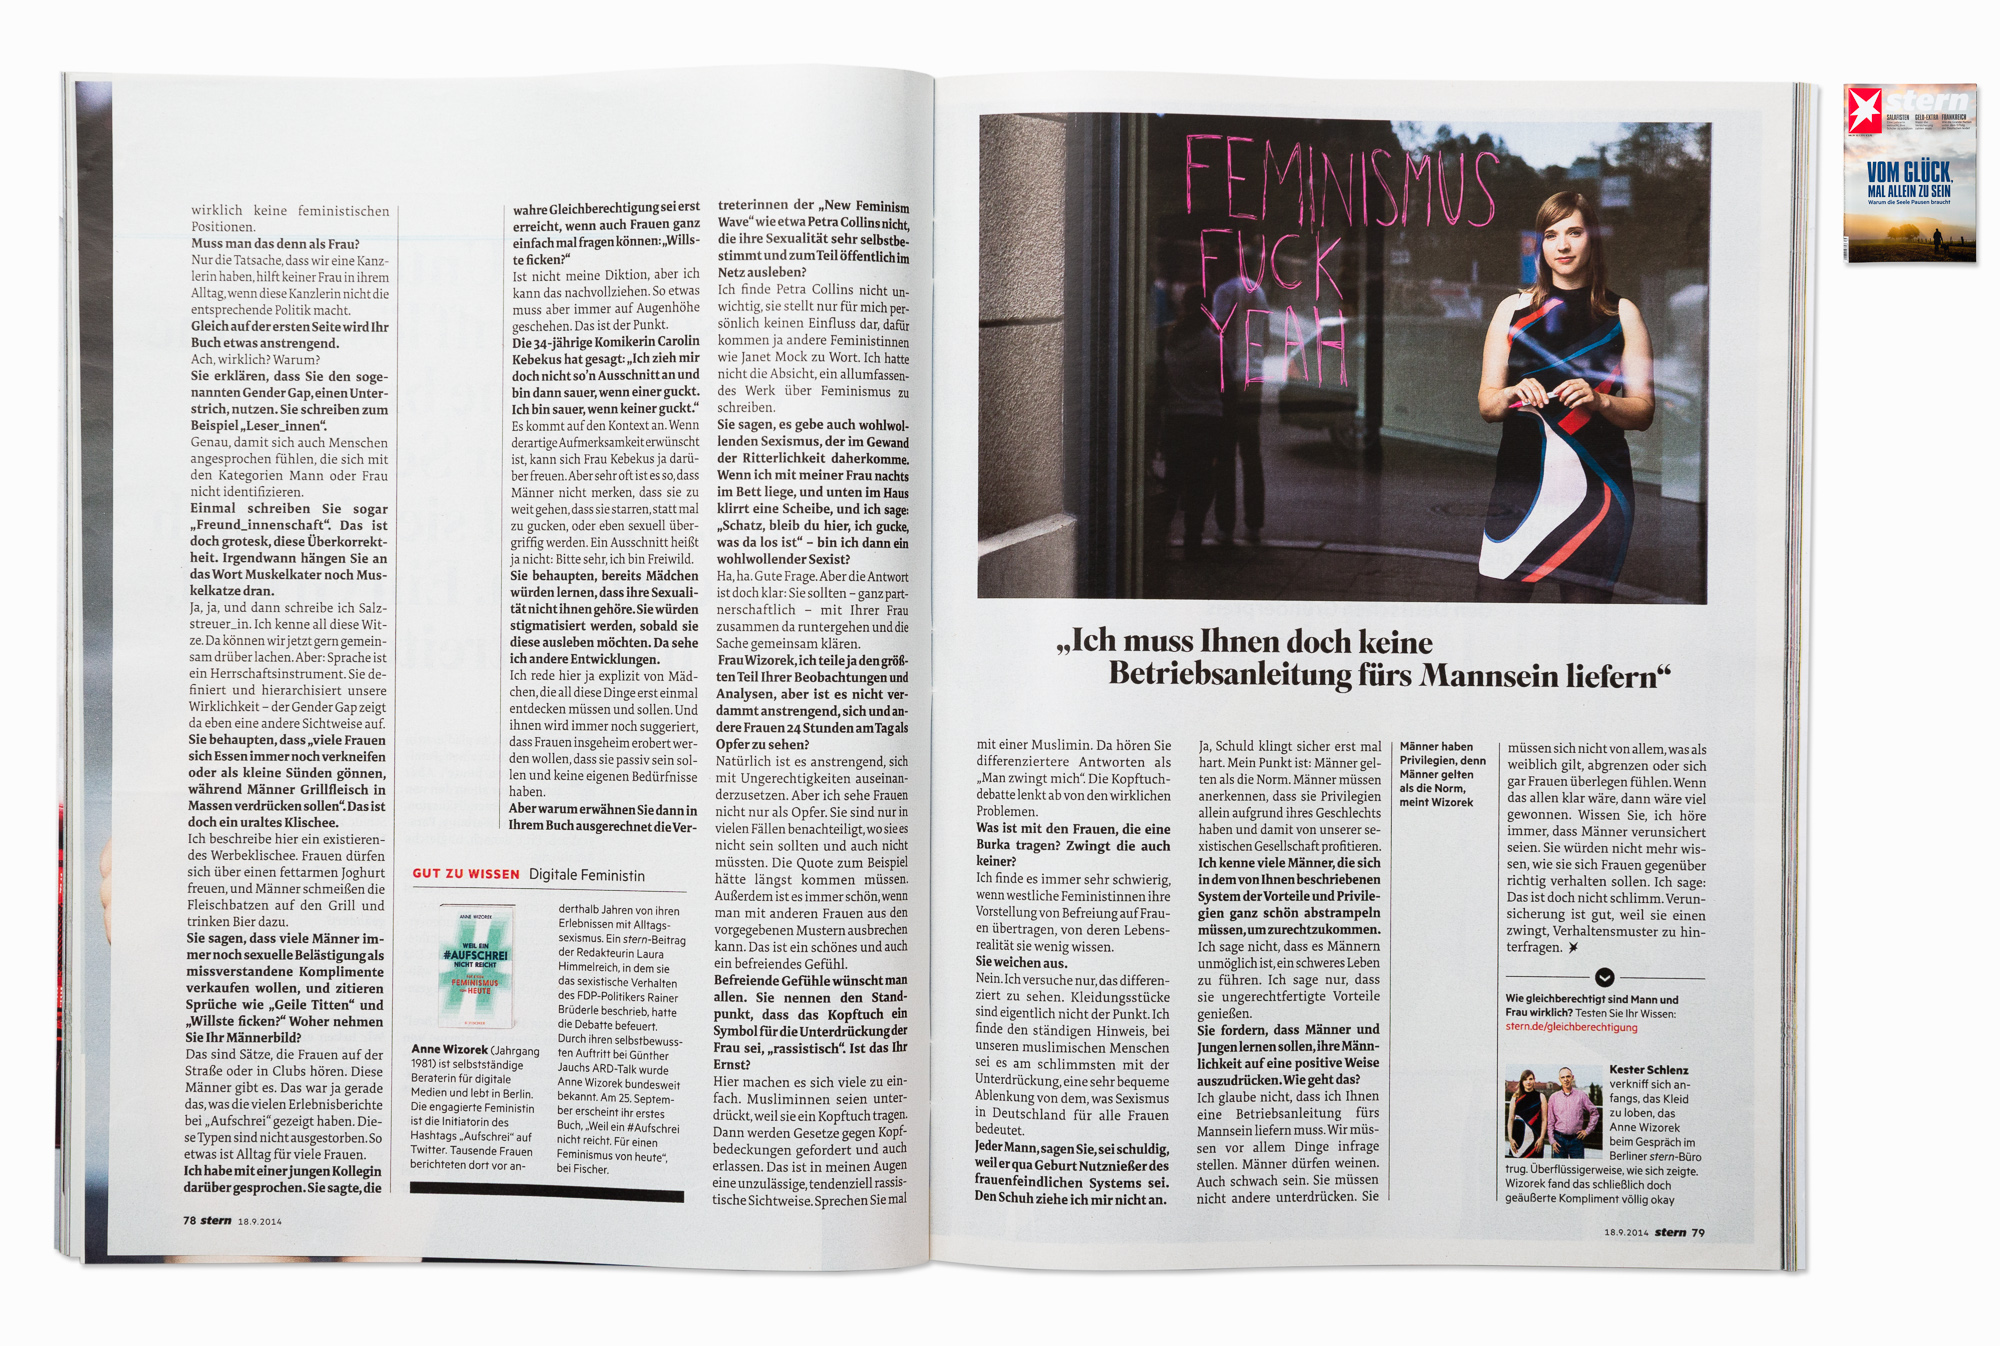 Author & feminist Anne Wizorek for STERN, Berlin 2014